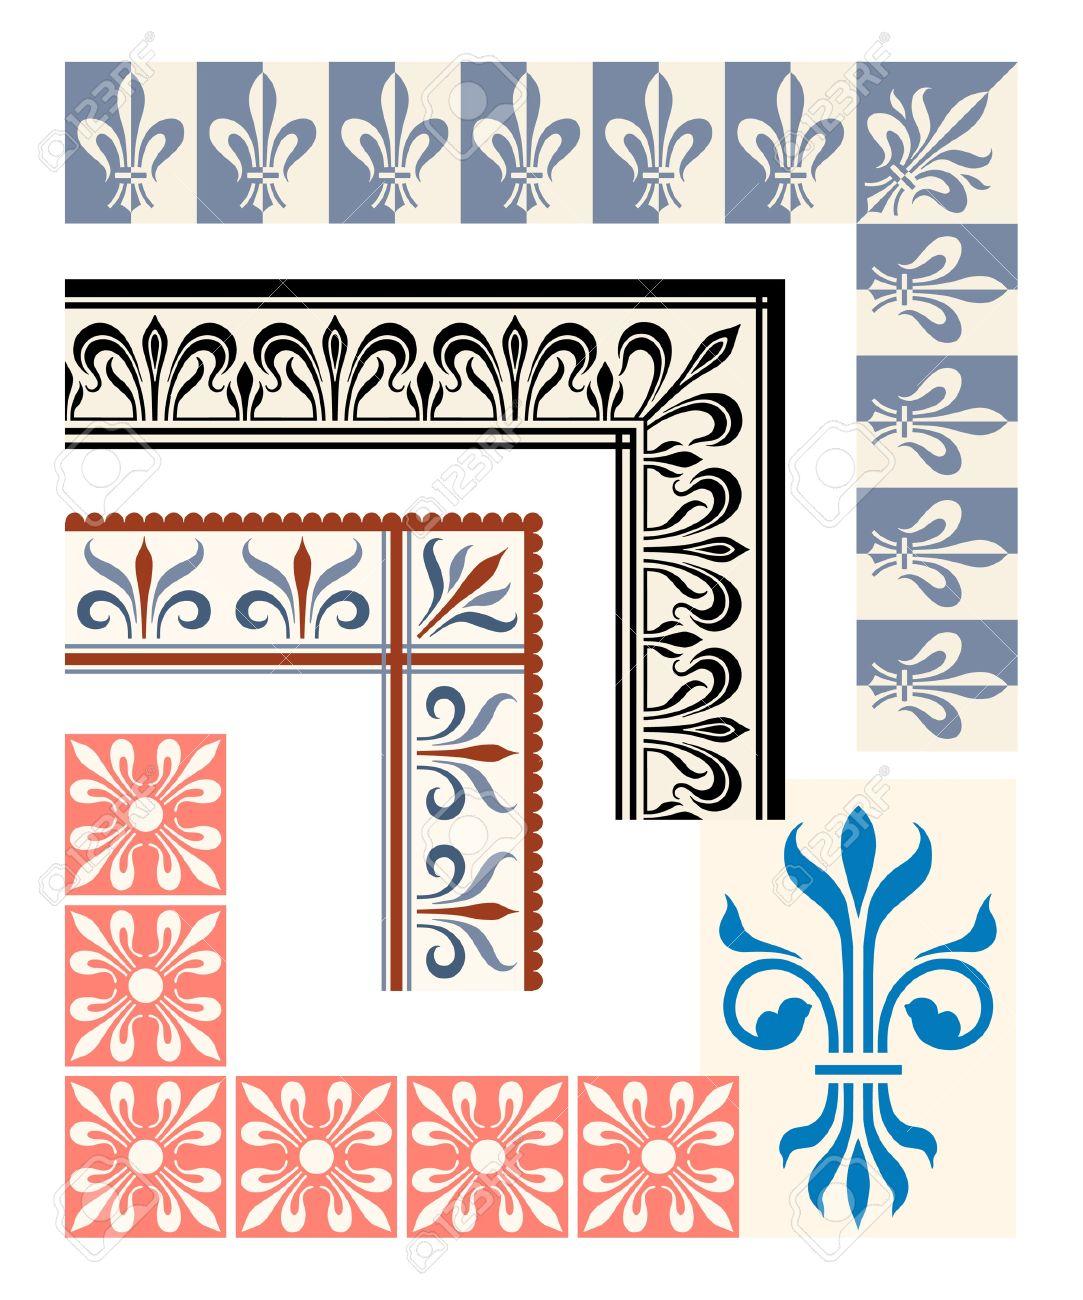 Fleur De Lys Frame And Border Set Heraldic Design Elements Royalty